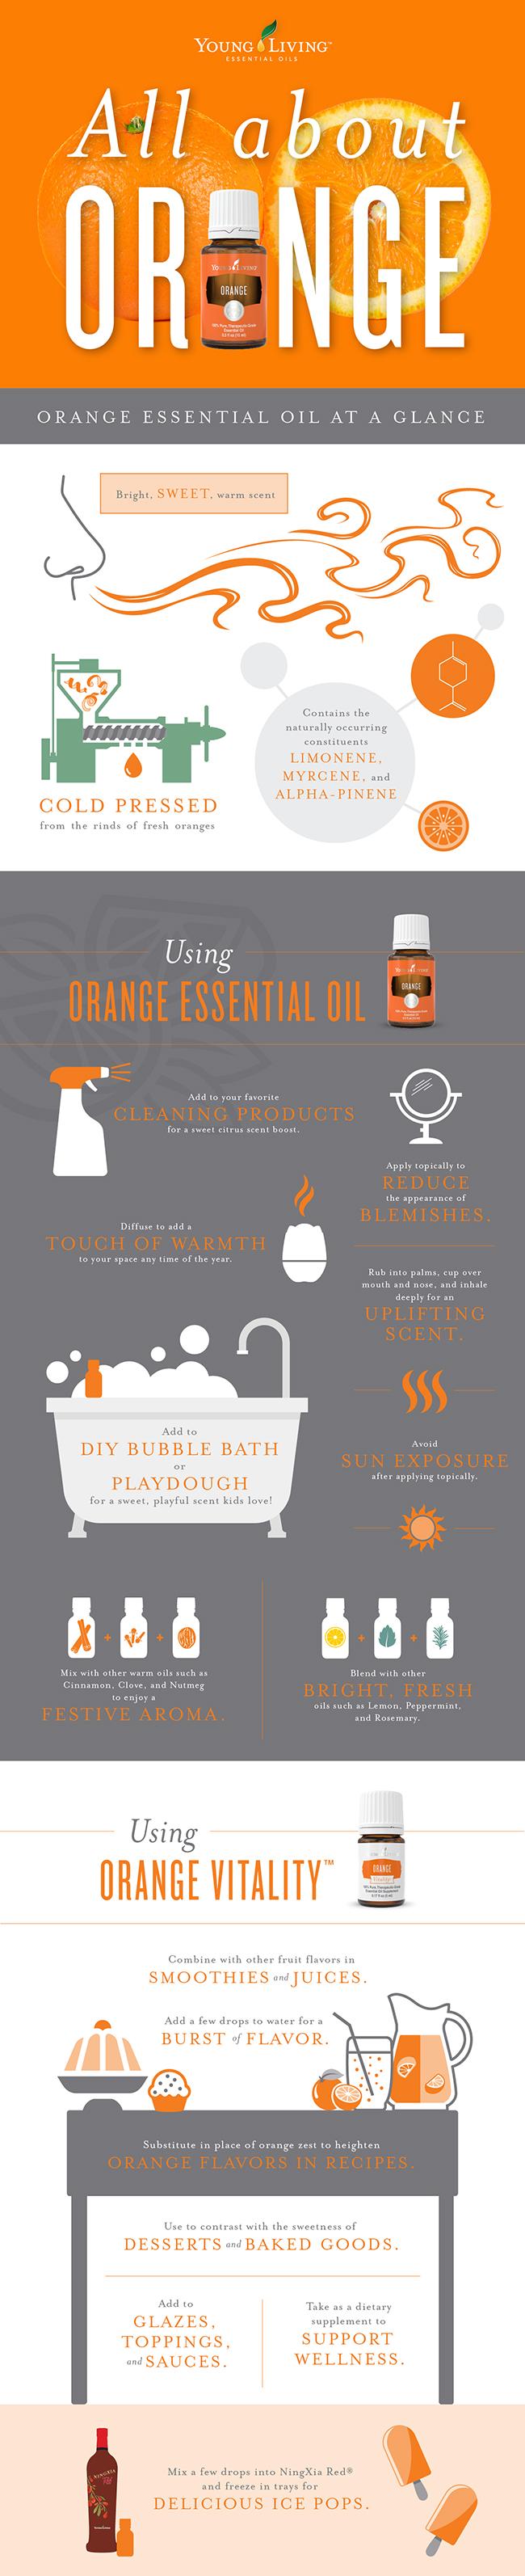 blog_AllAboutOrange_infographic_US